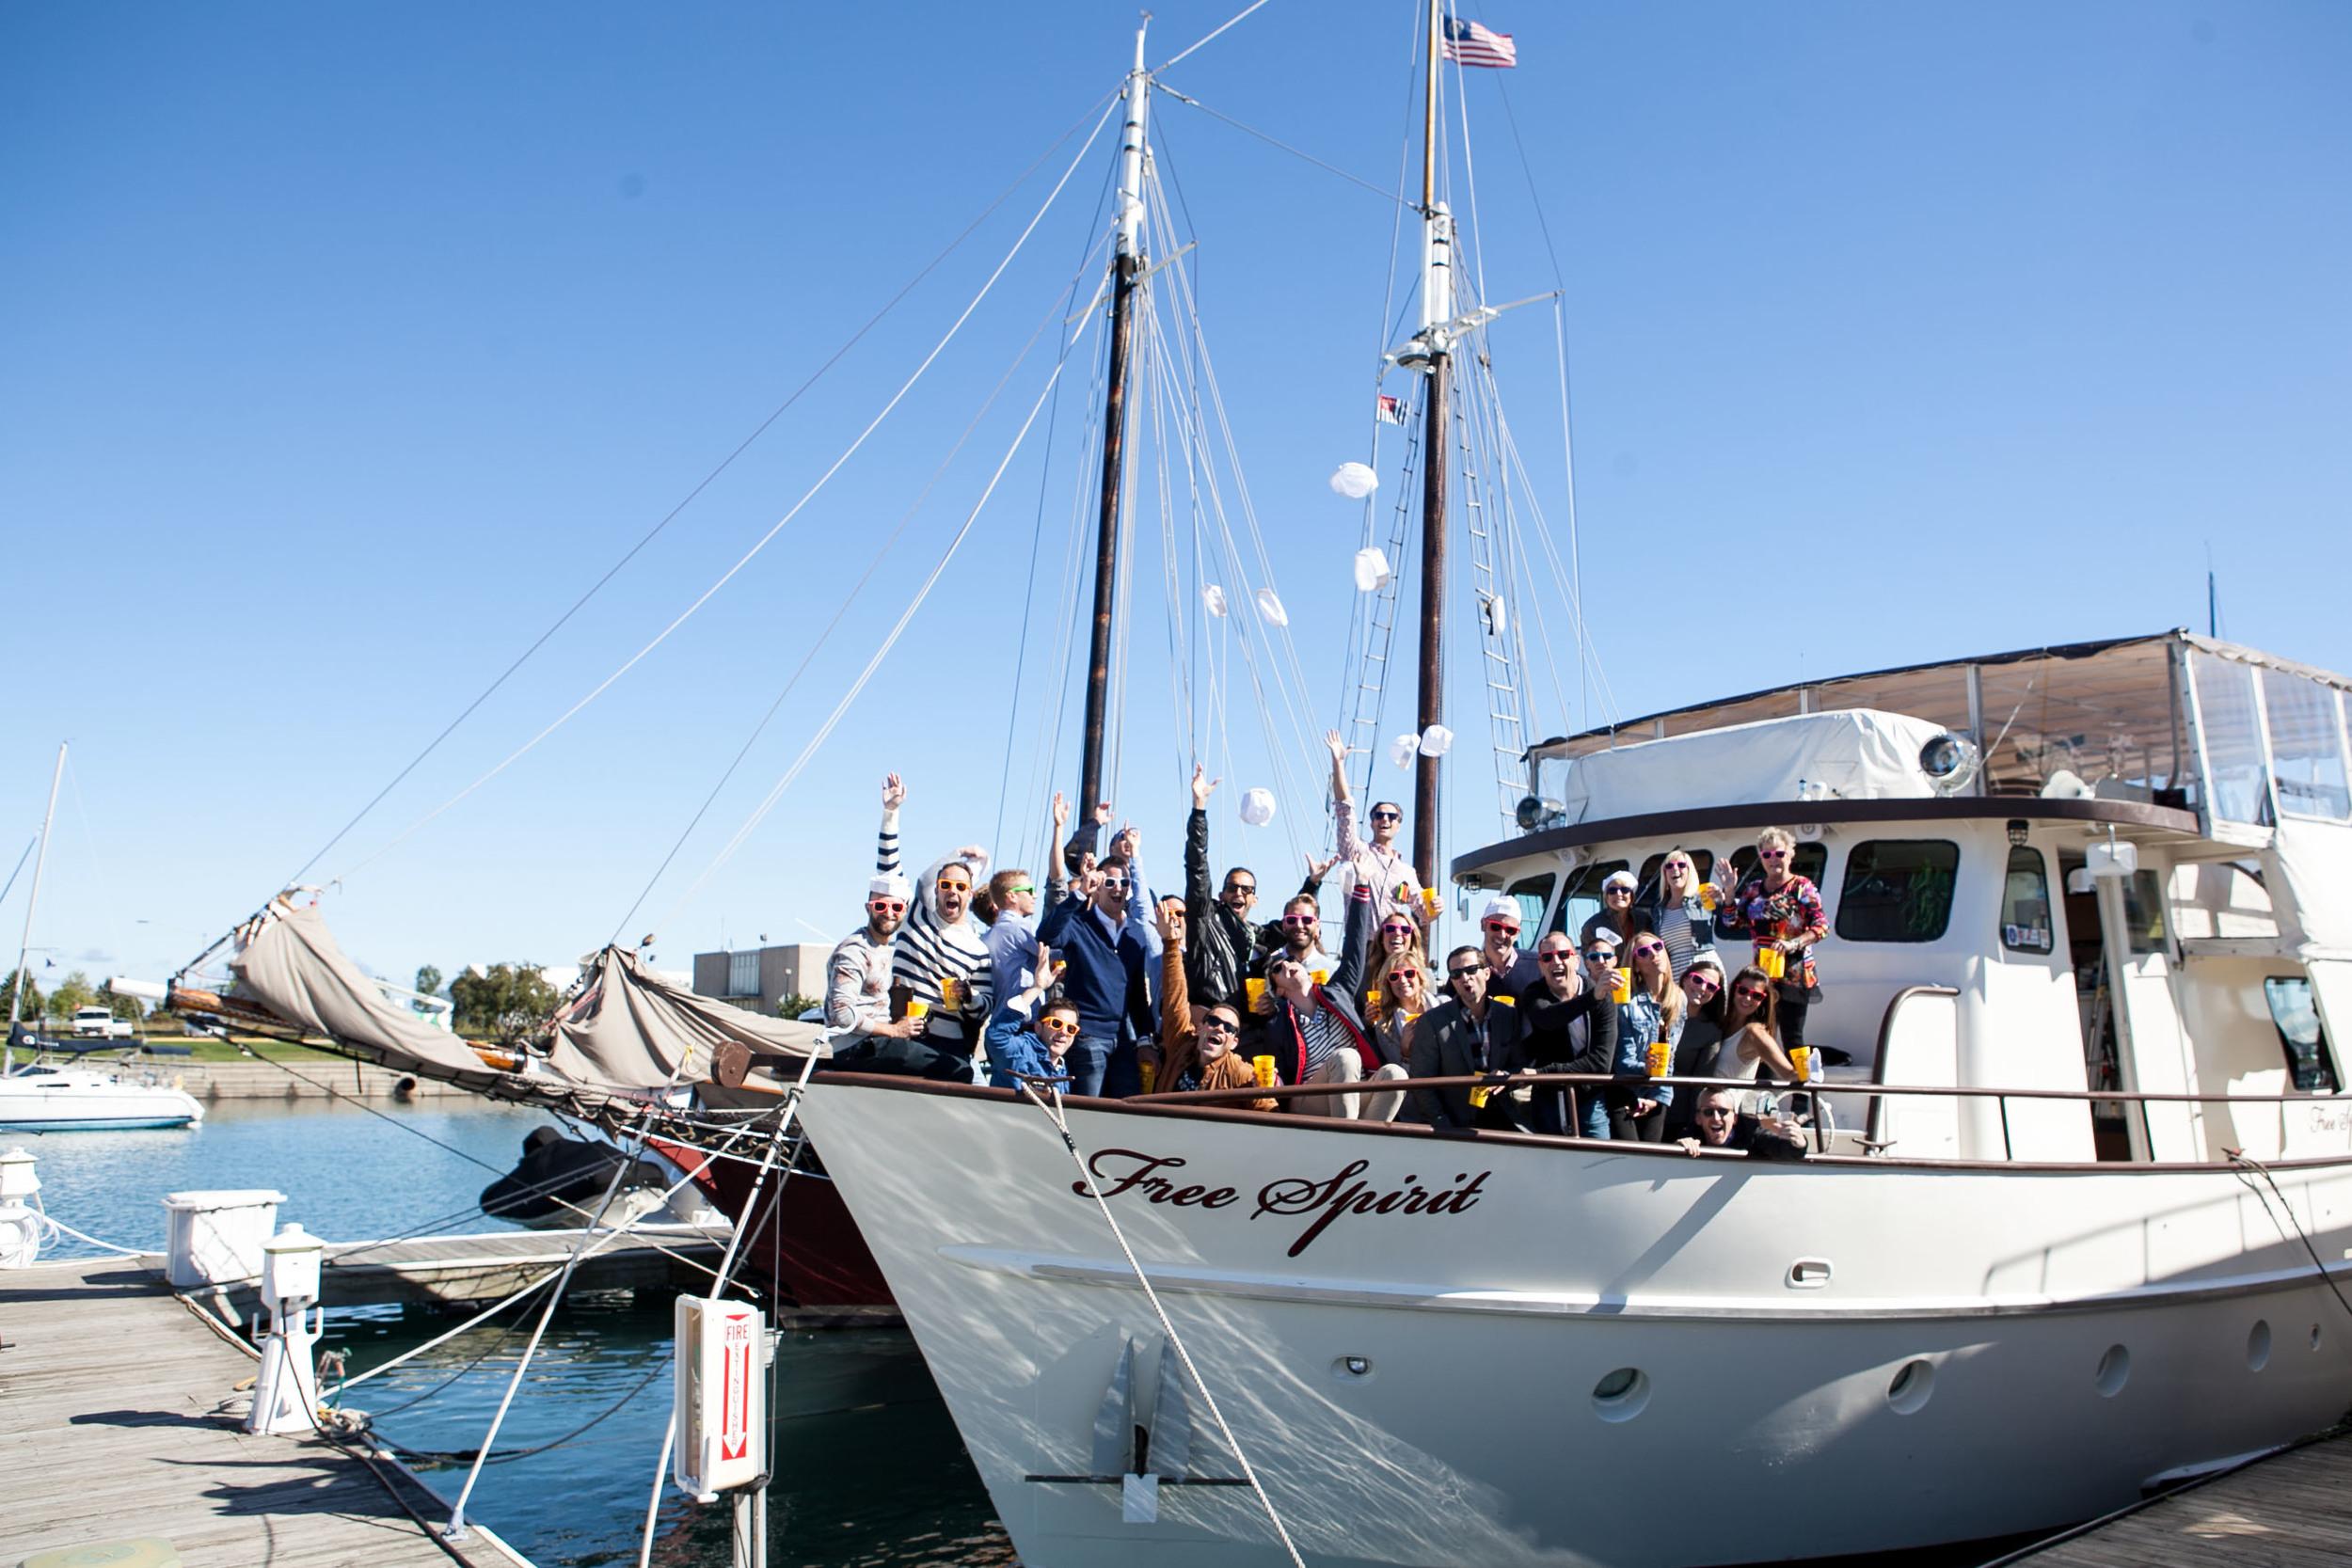 tyler's 30th chinanigans birthday celebration trolley tour of the loop burnham harbor yacht tour-40.jpg